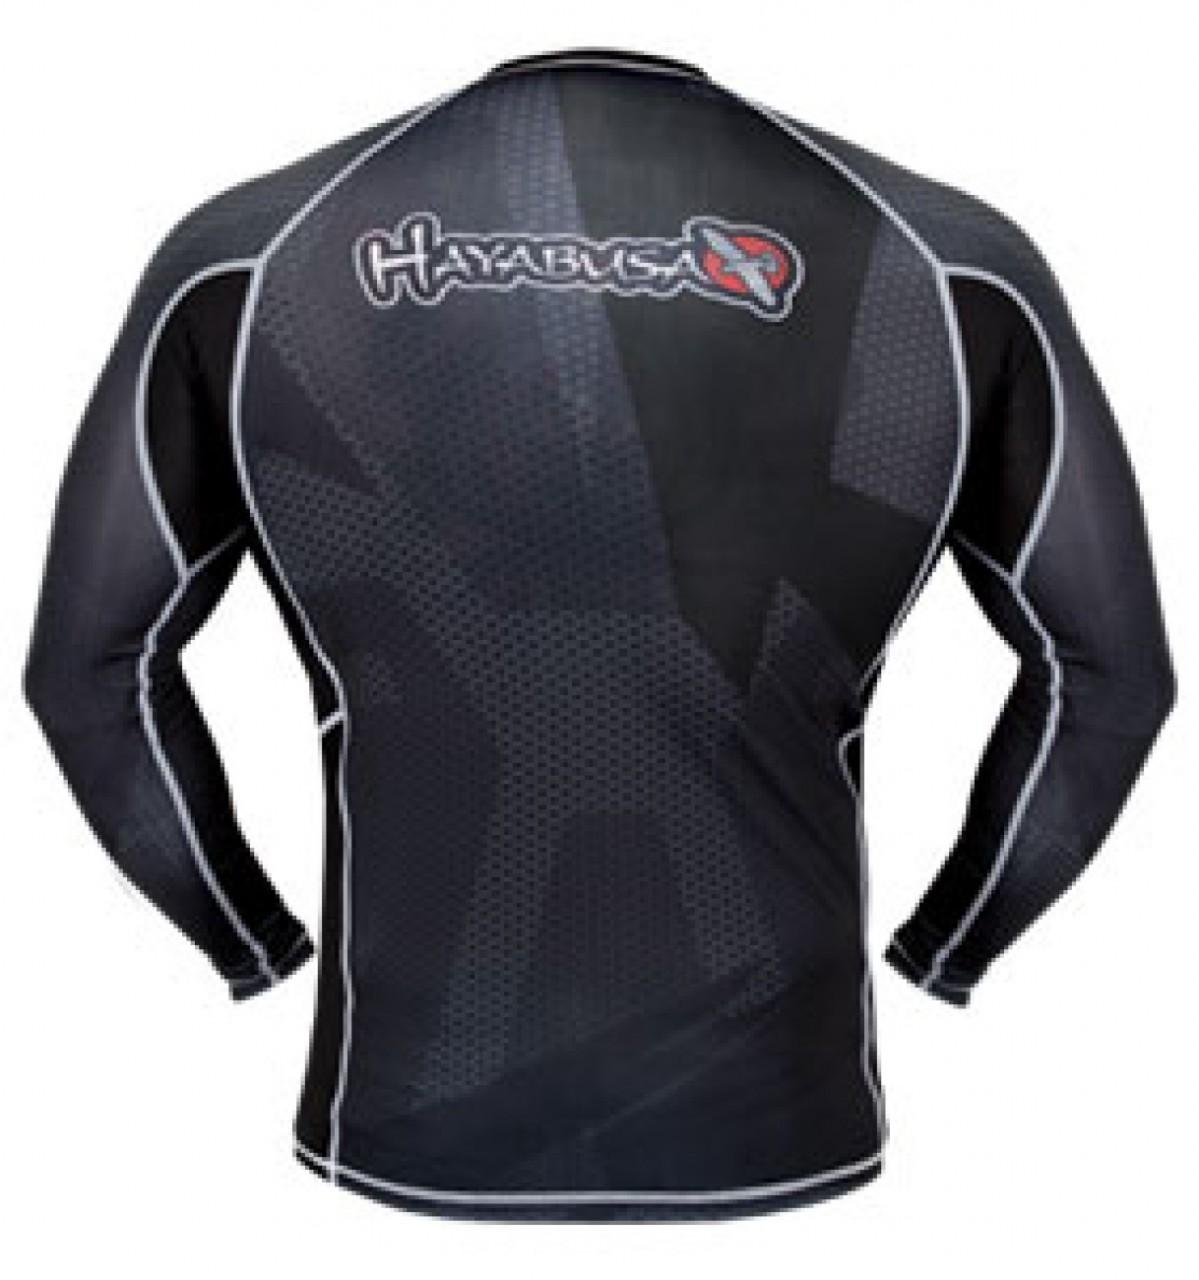 Hayabusa Metaru 47 Silver Rashguard Long Sleeve - Black